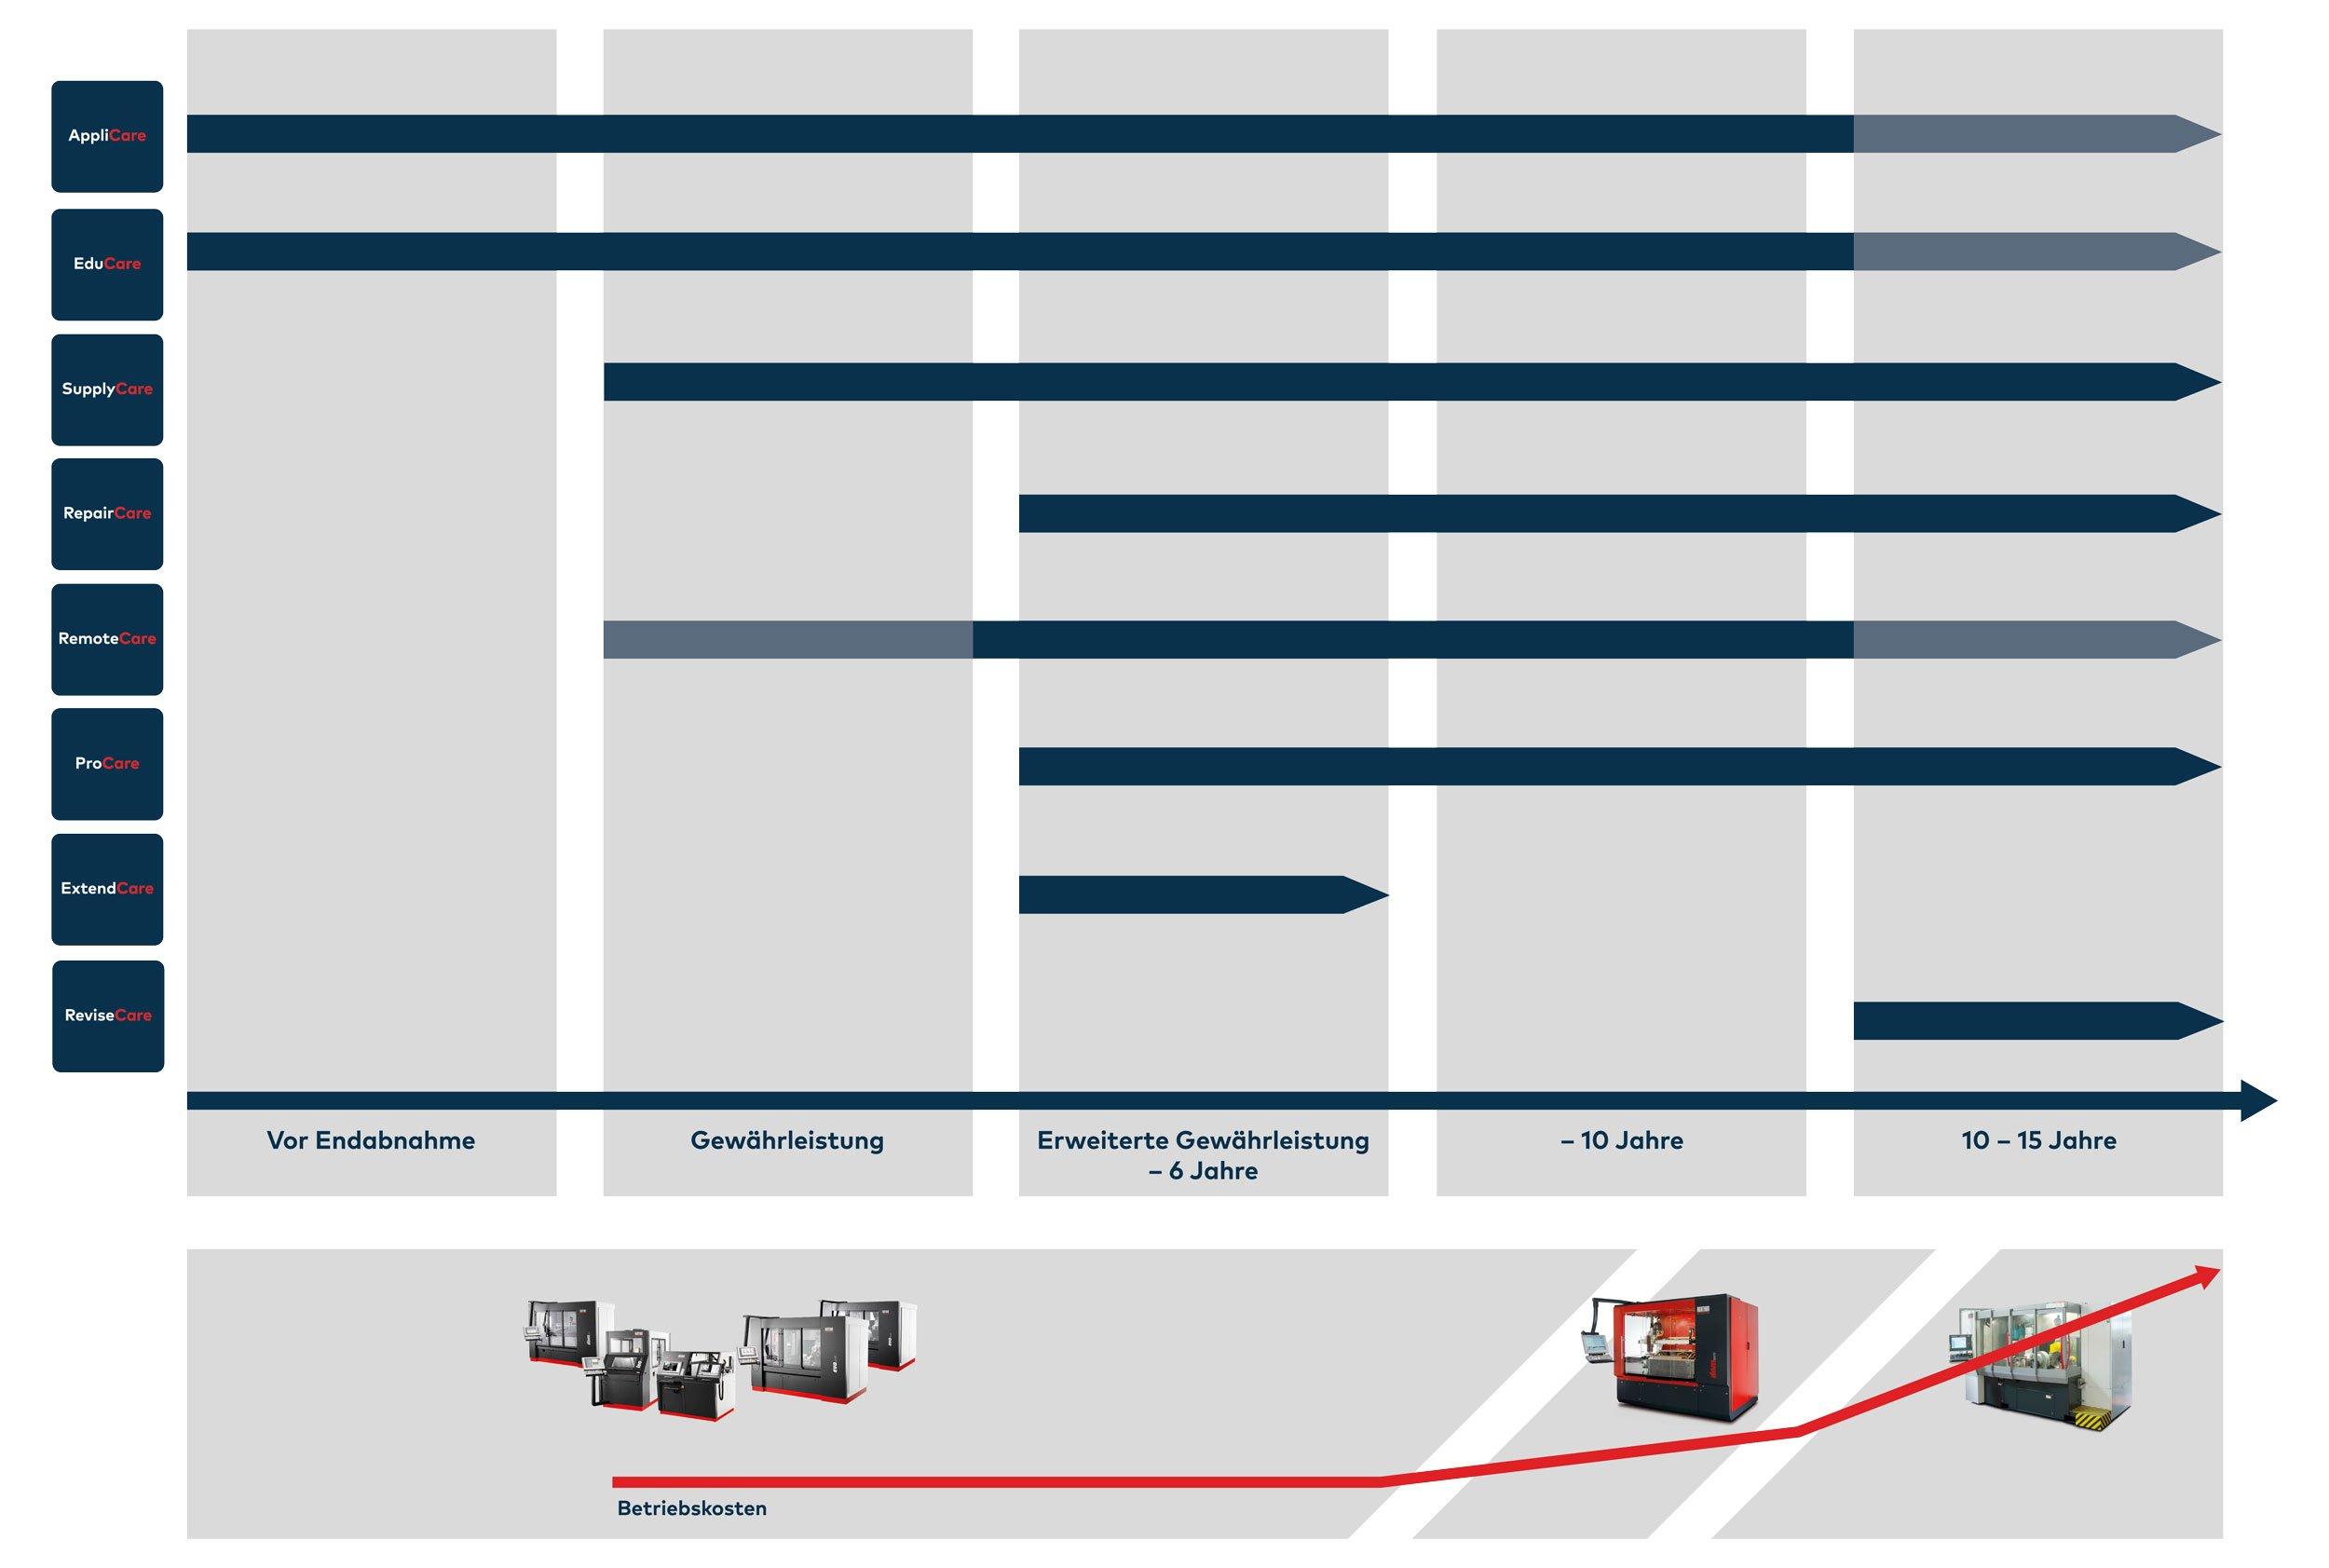 20200903_Agathon-Care-360_Produktlebenszyklus_DE